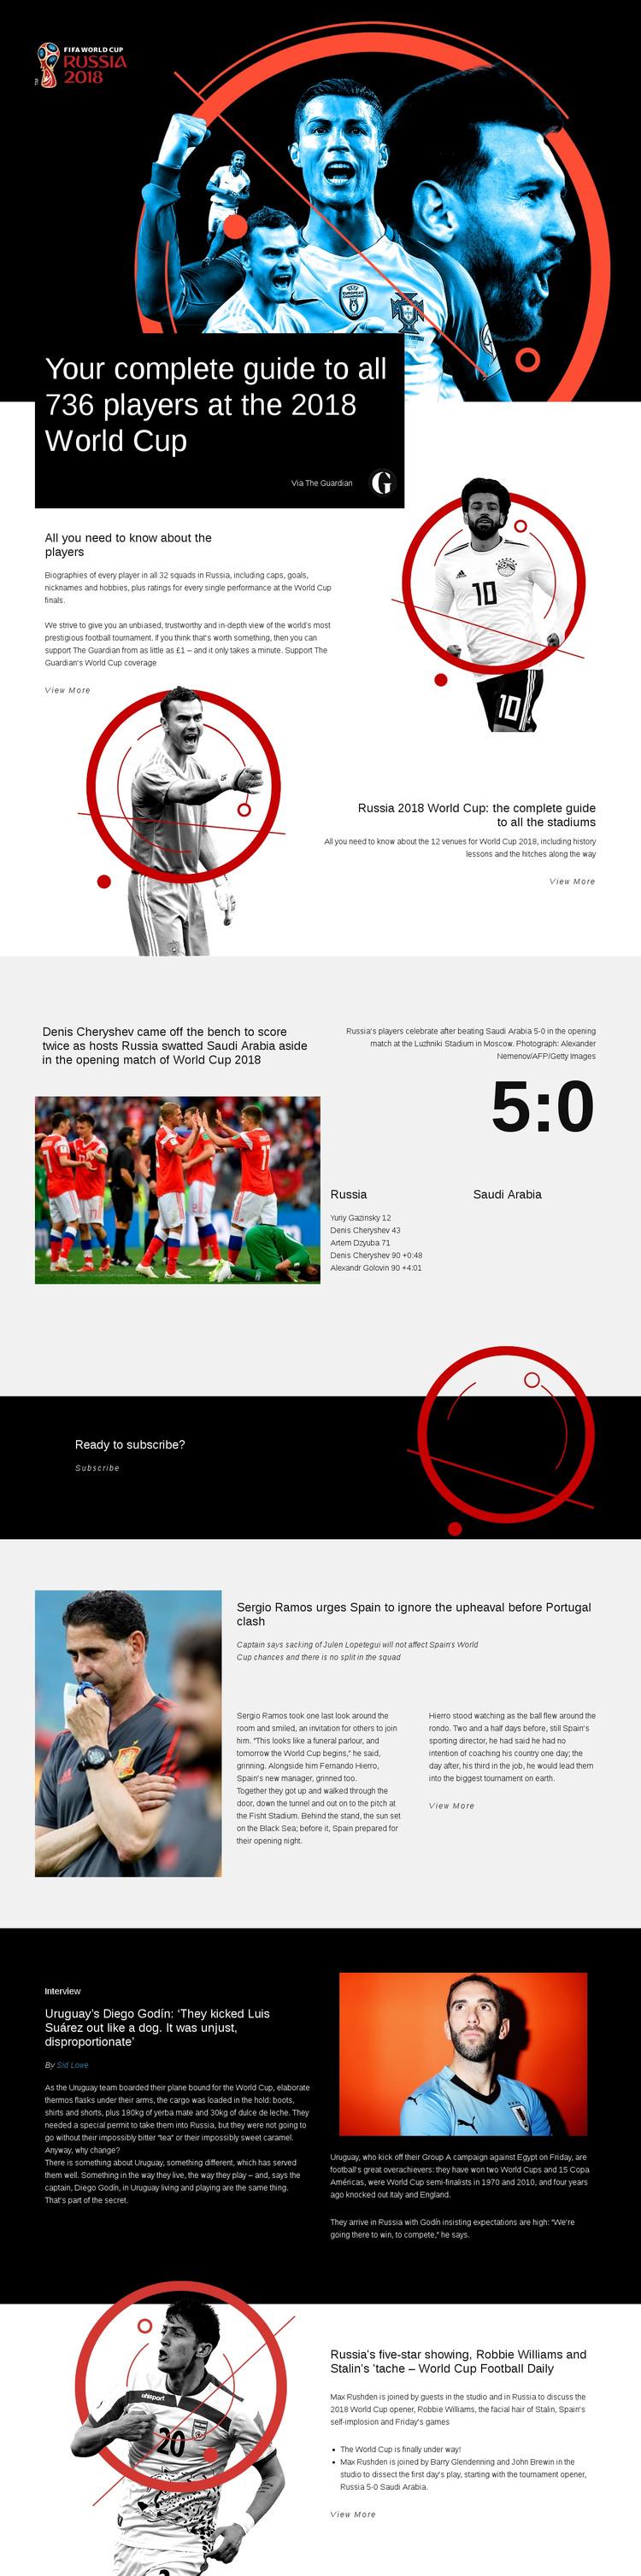 World Cup 2018 Joomla Template